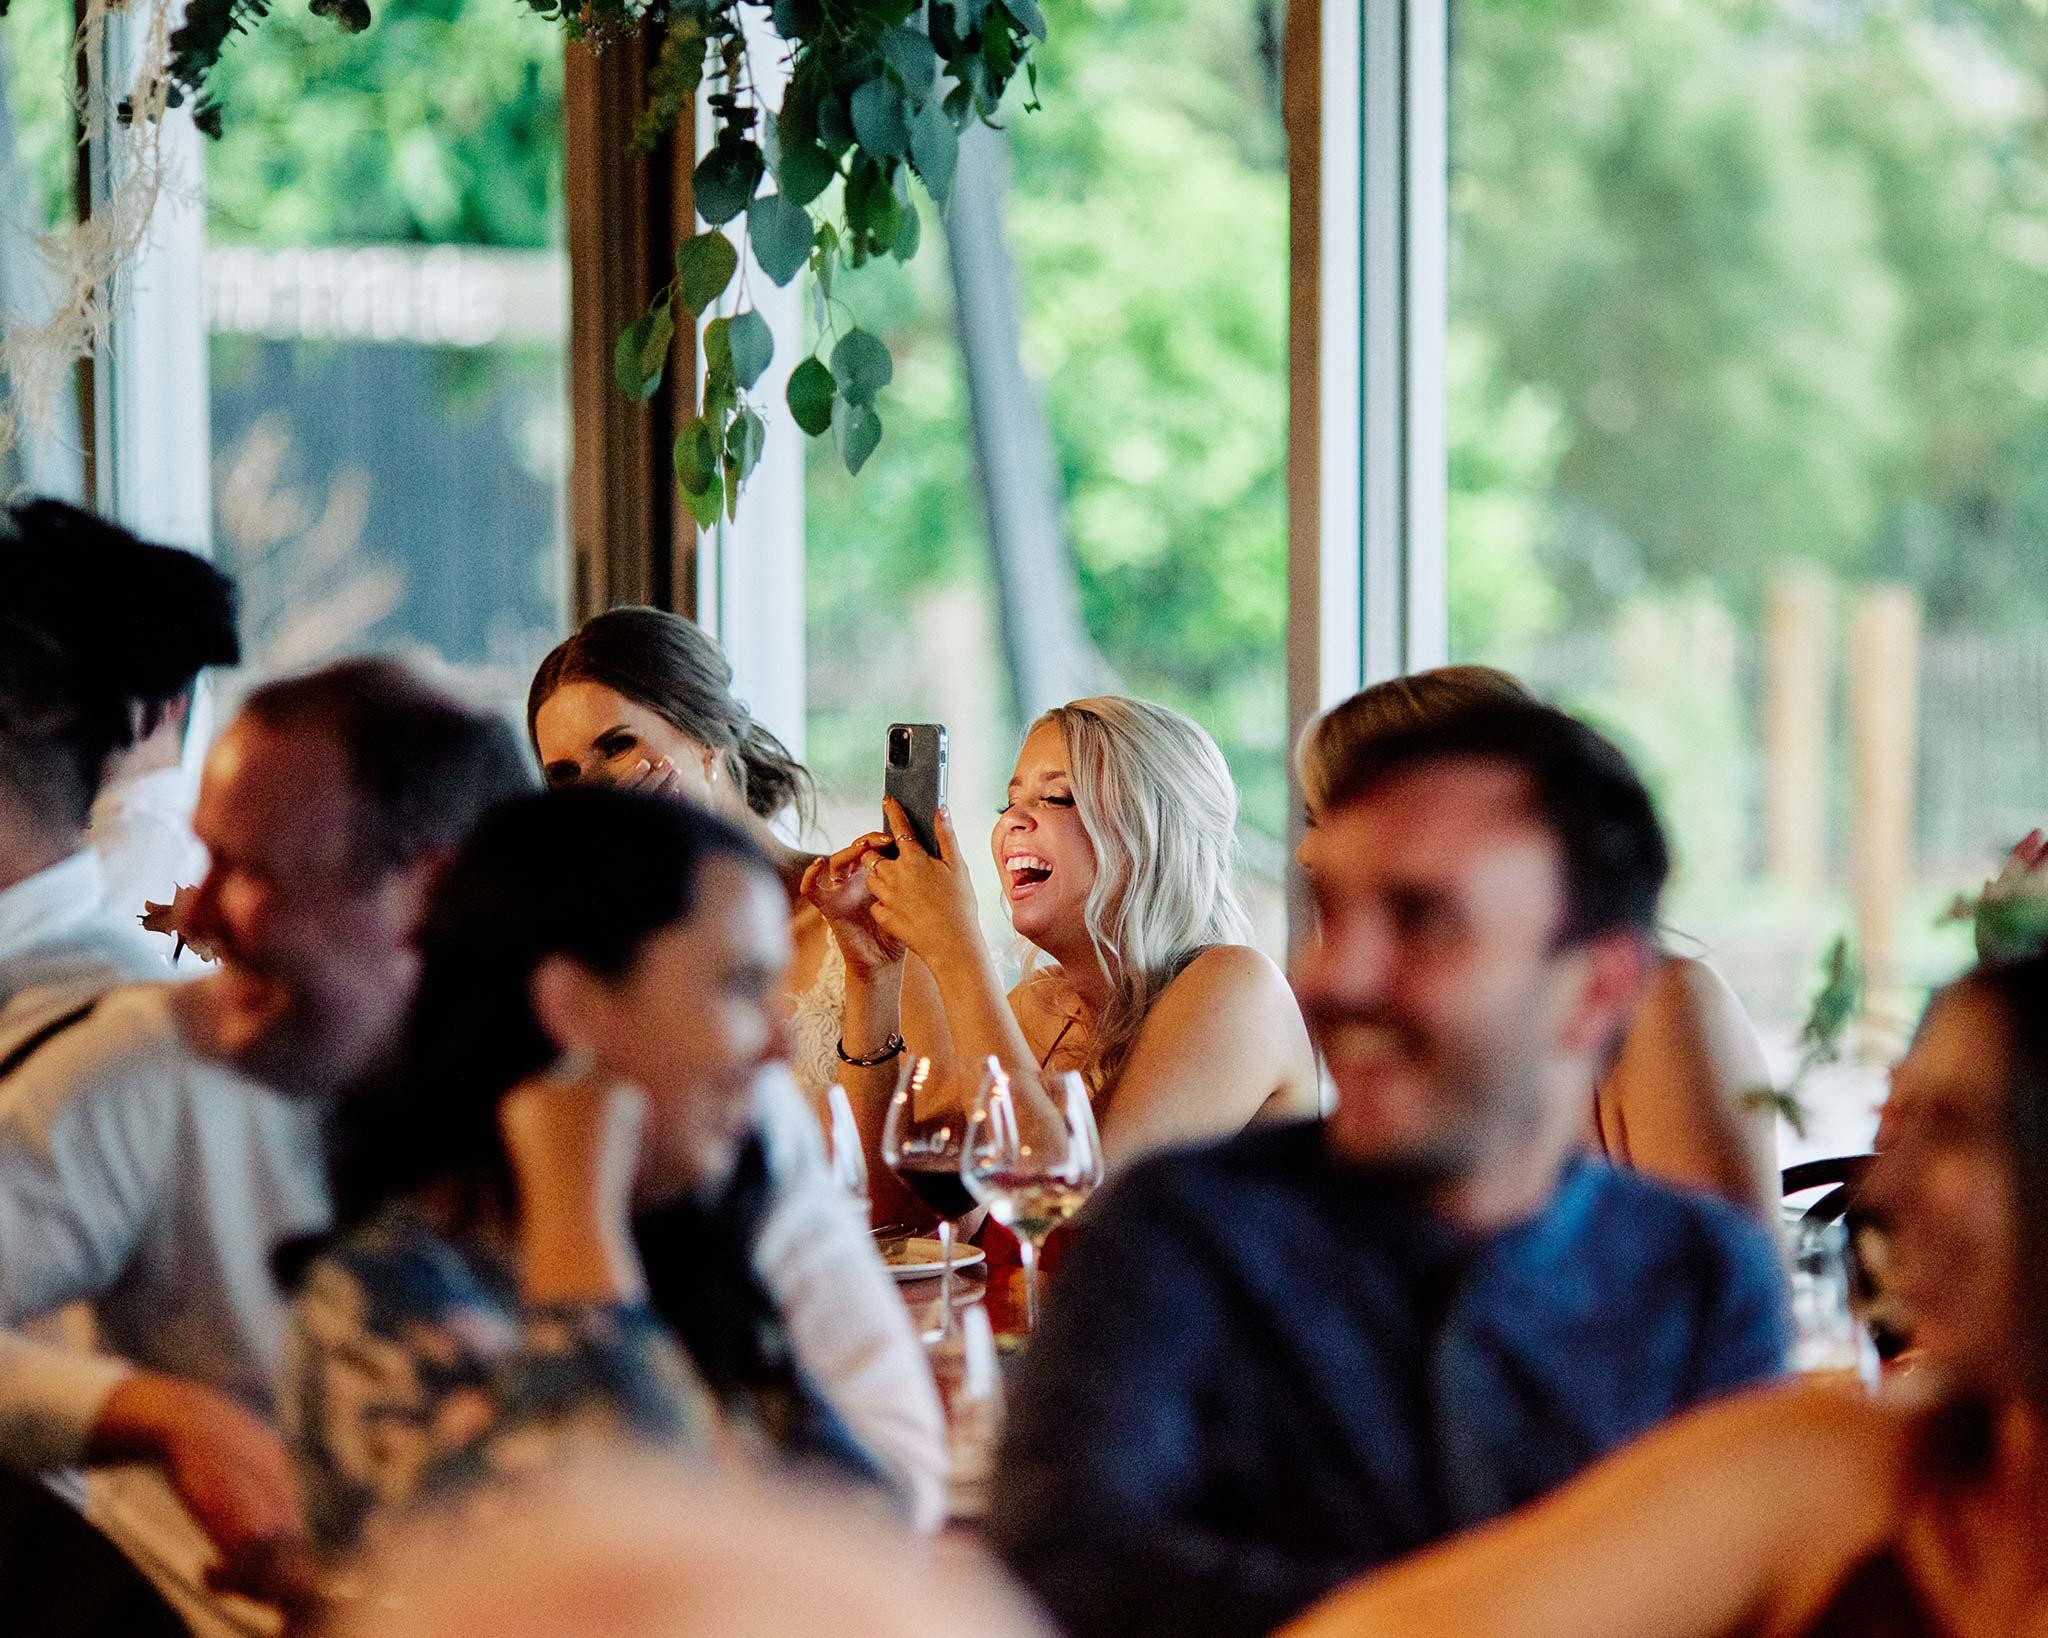 zonzo wedding photography reception videoing speech